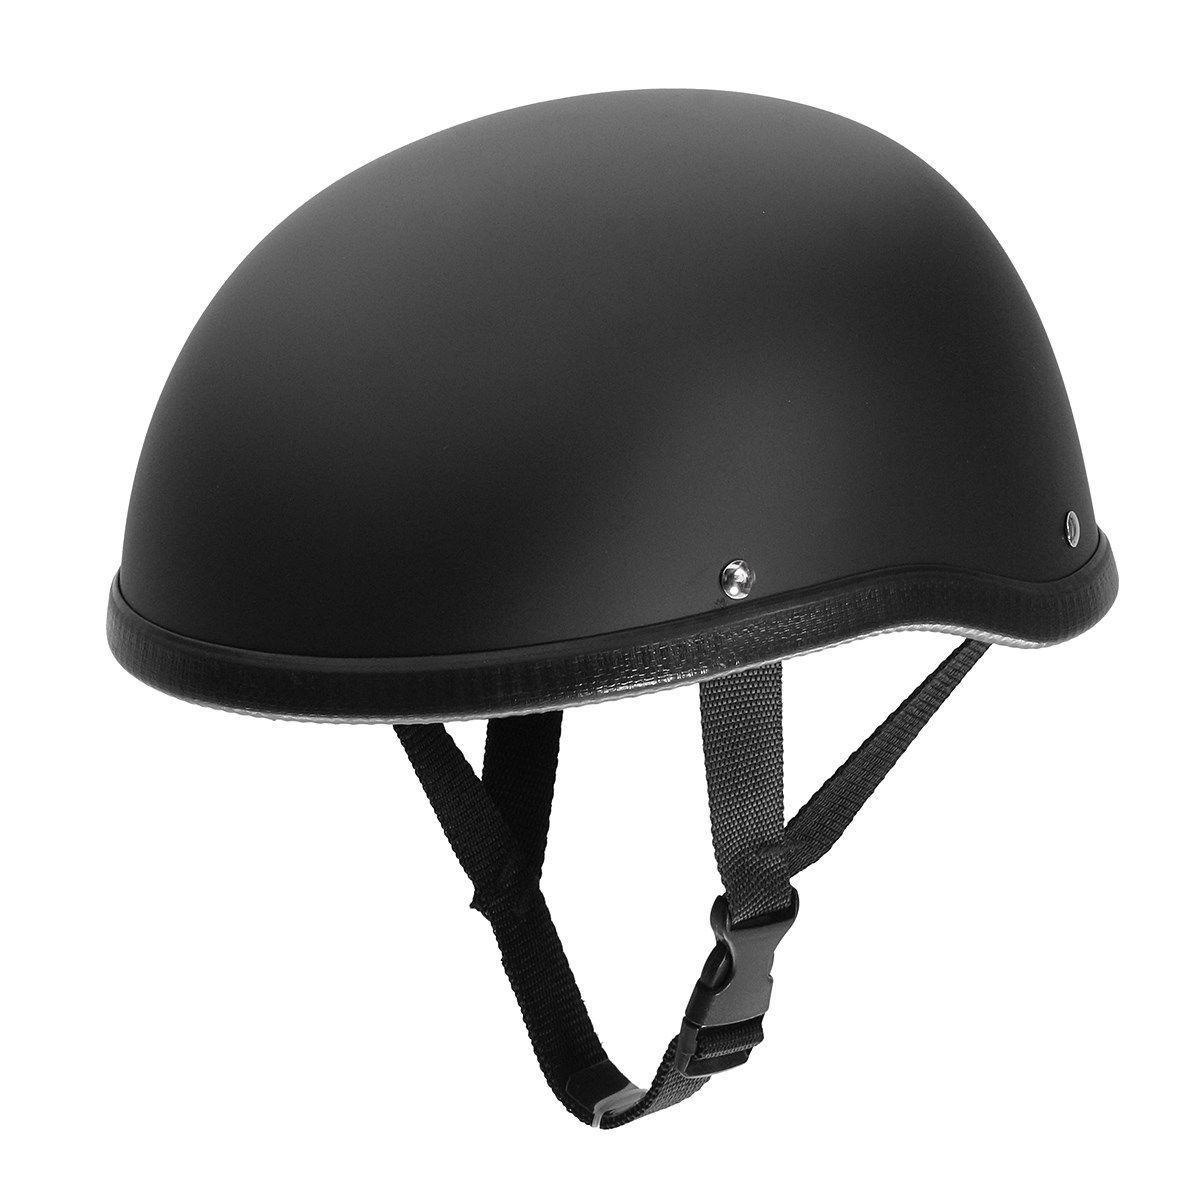 <font><b>Matte</b></font> Black Motorcycle Half Helmet Skull Cap Low Profile Novelty For Harley Chopper